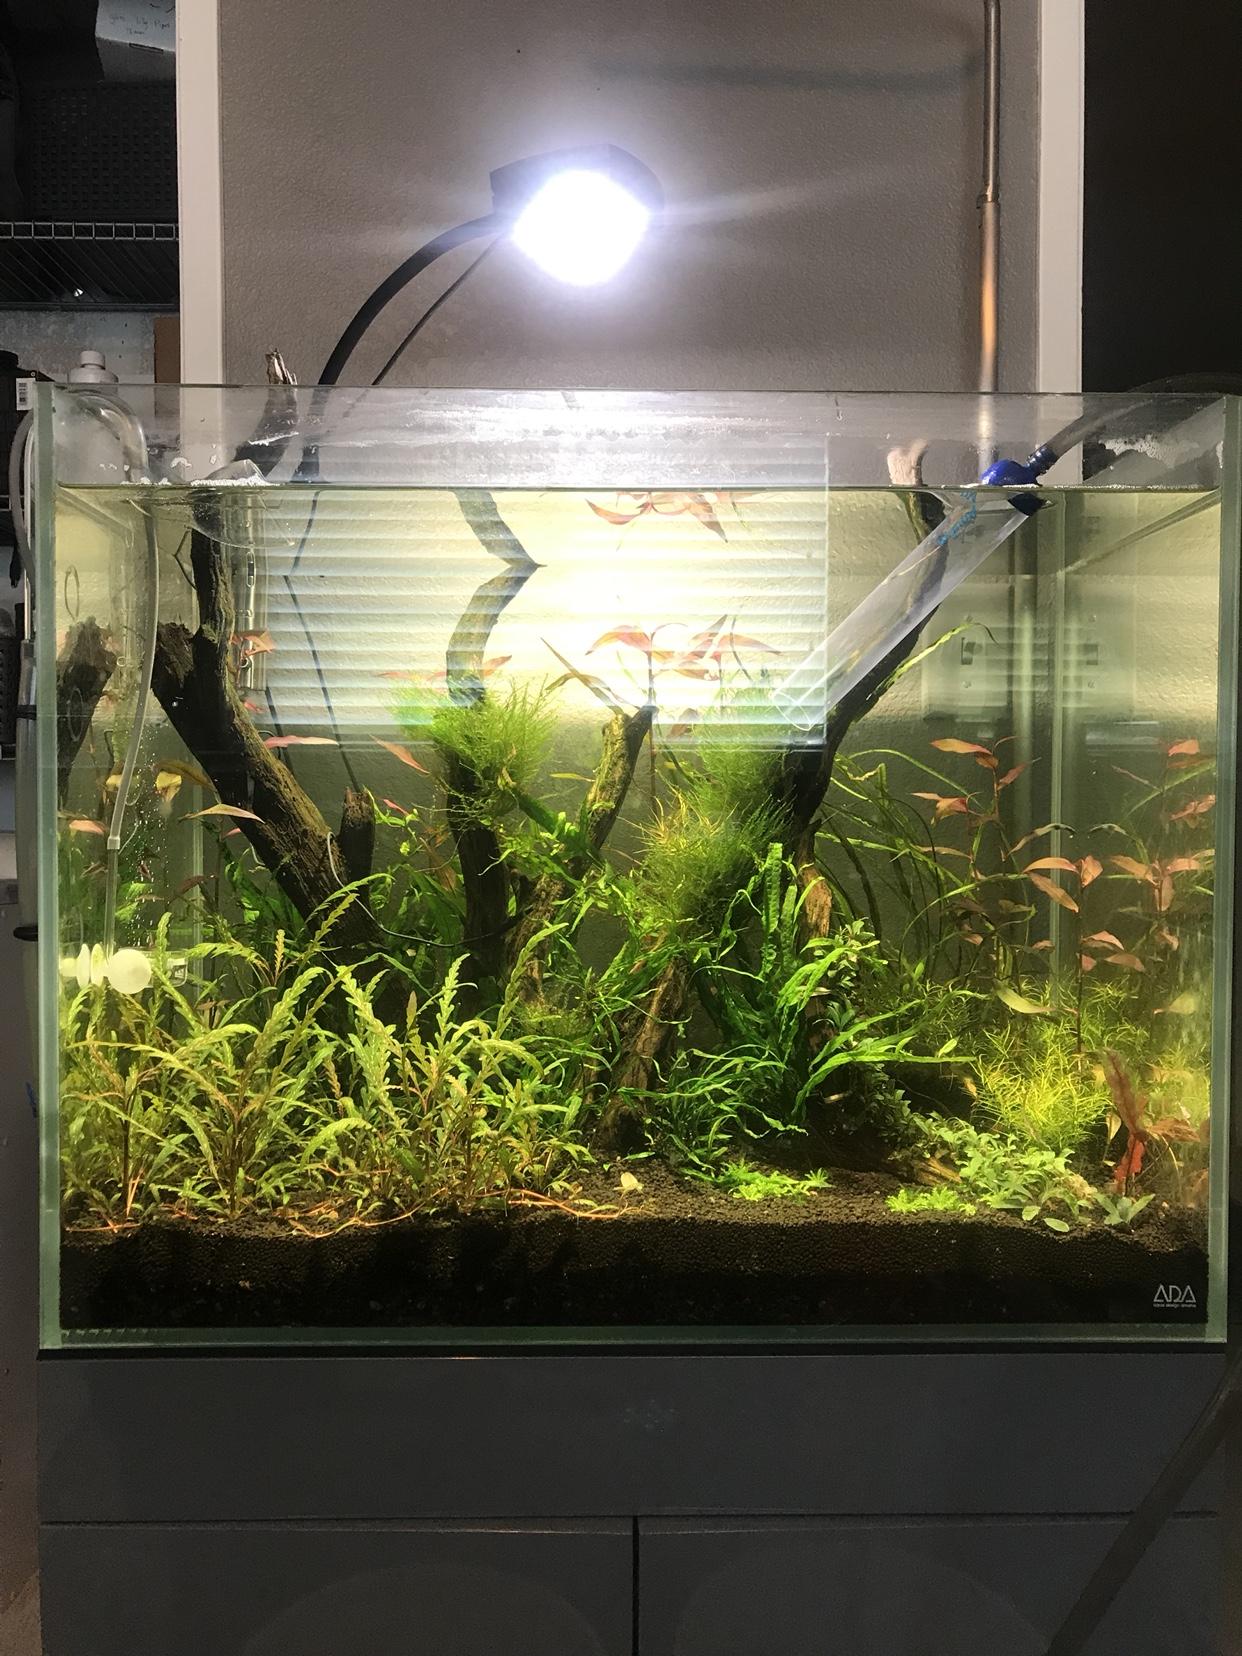 D&d Ai Prime Freshwater Hd Led Light Black Pet Supplies